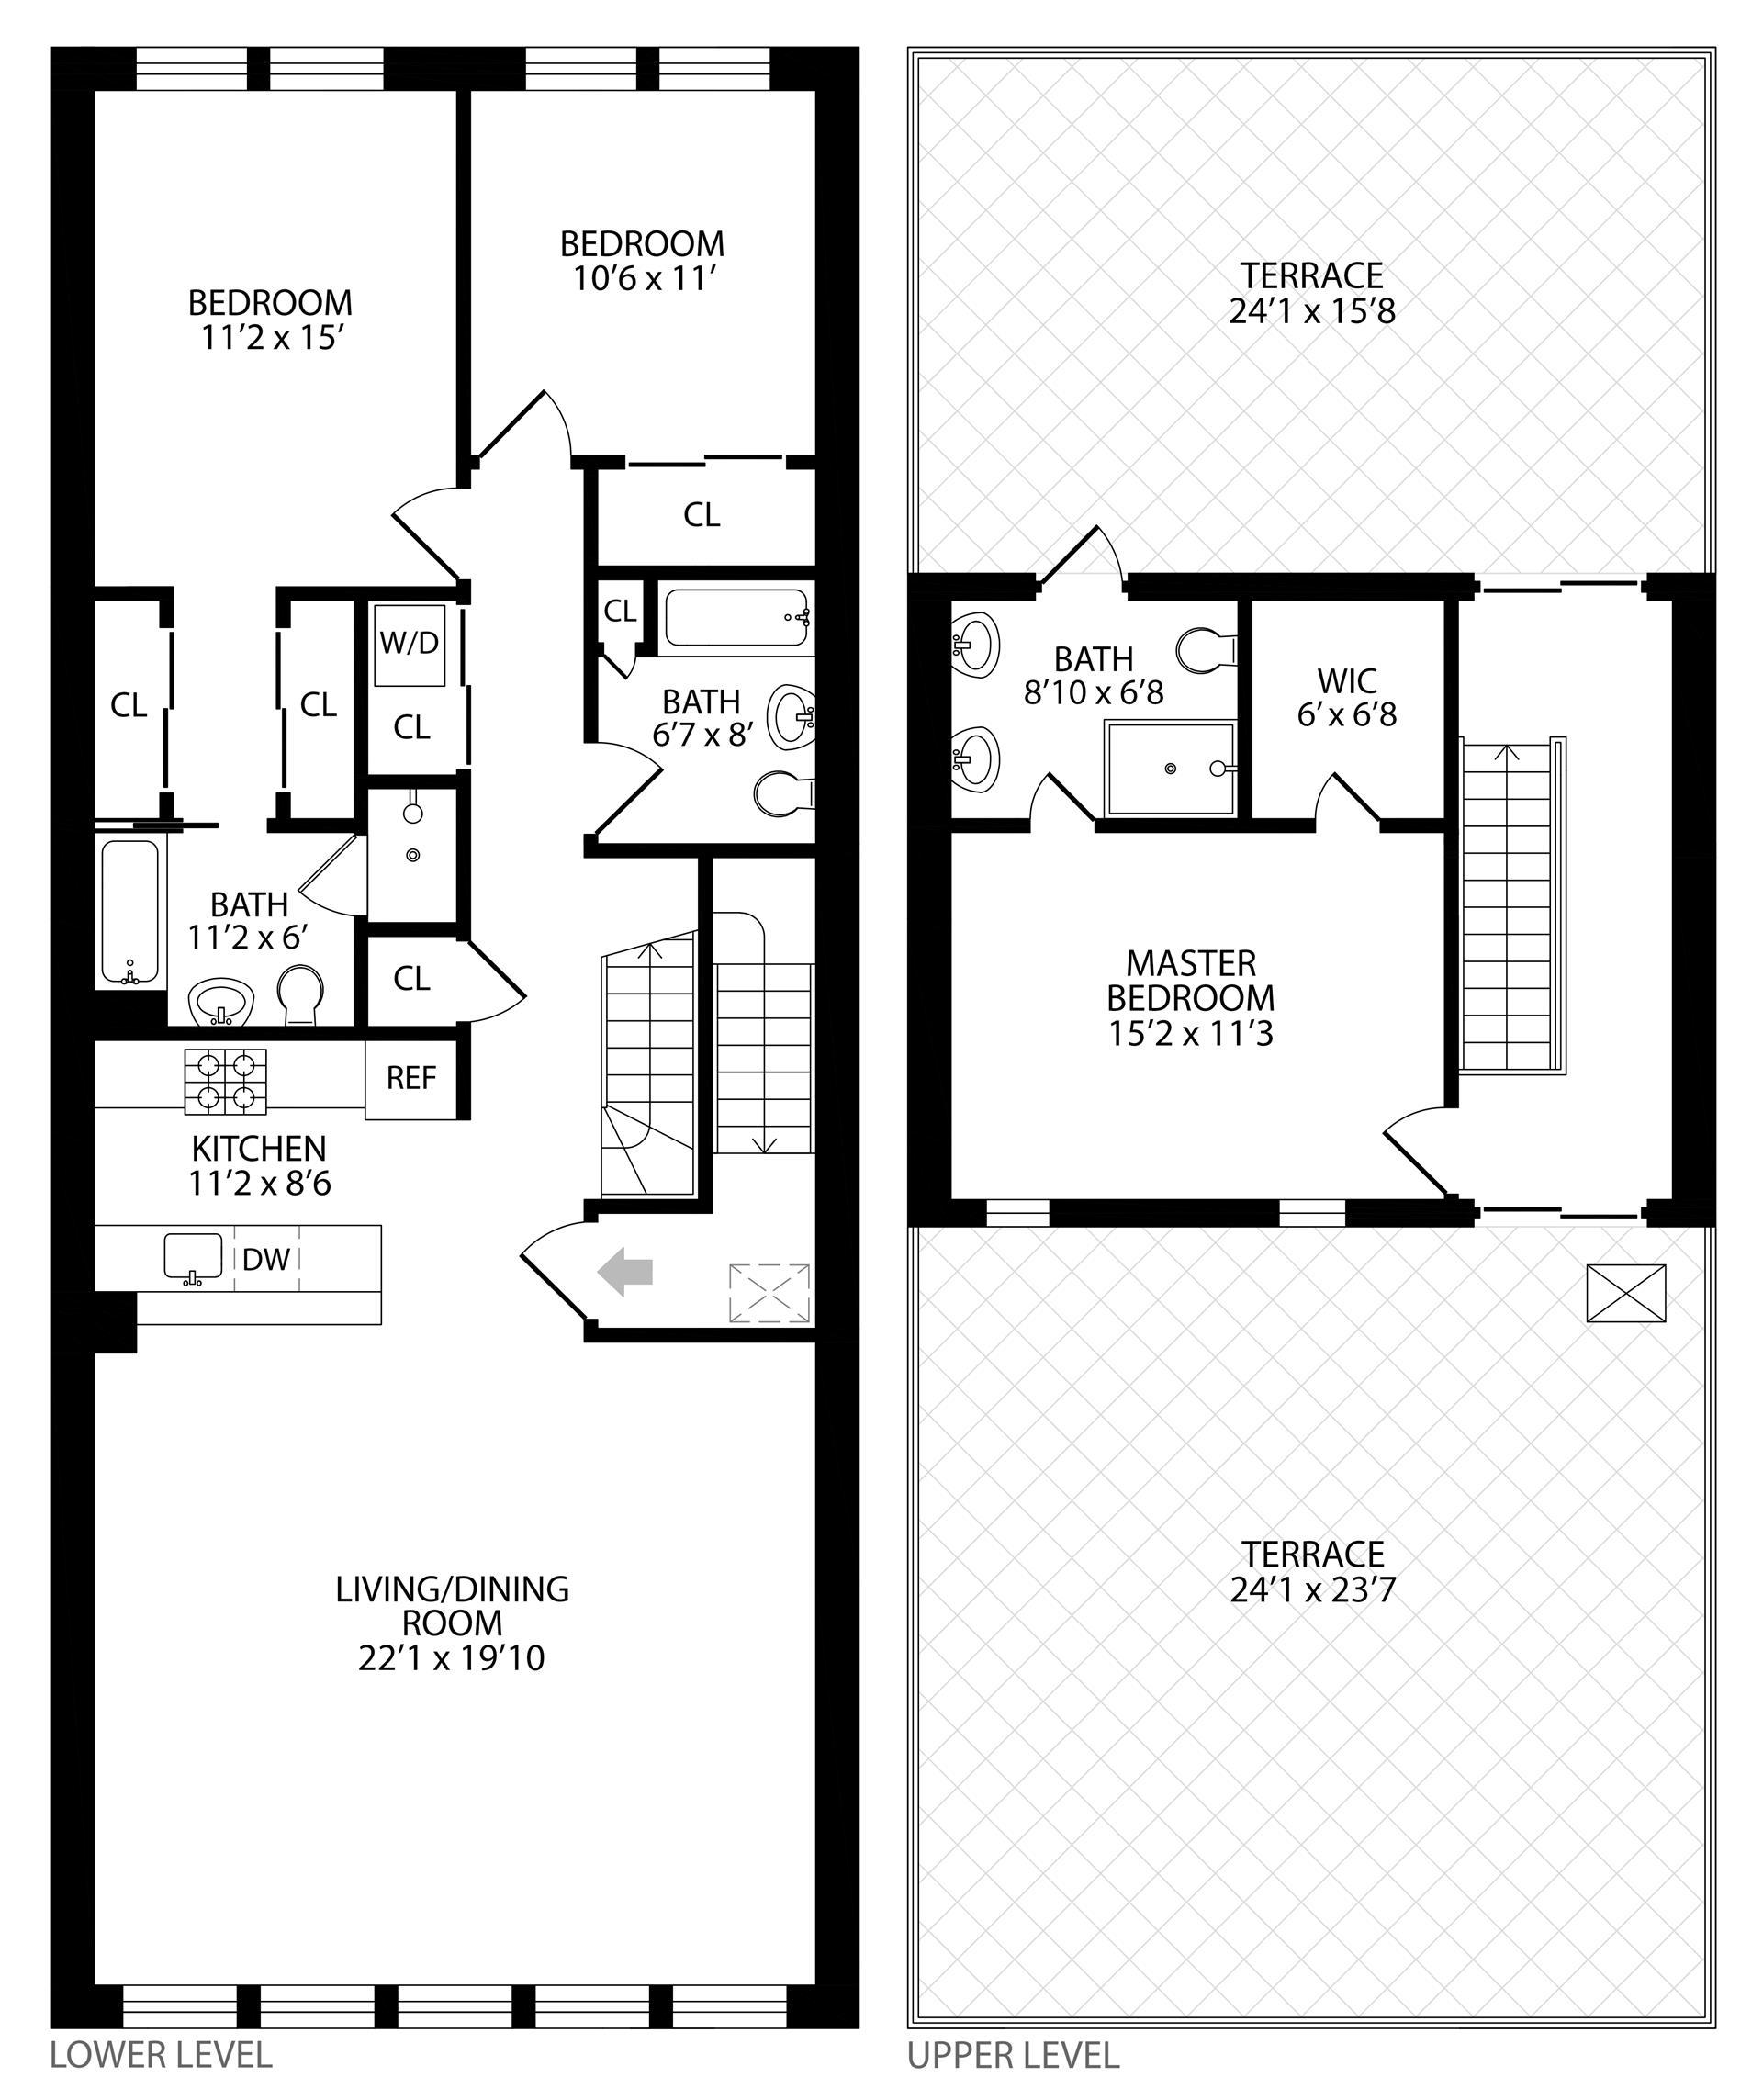 Floor plan of 197 22nd St, 3 - Greenwood, New York